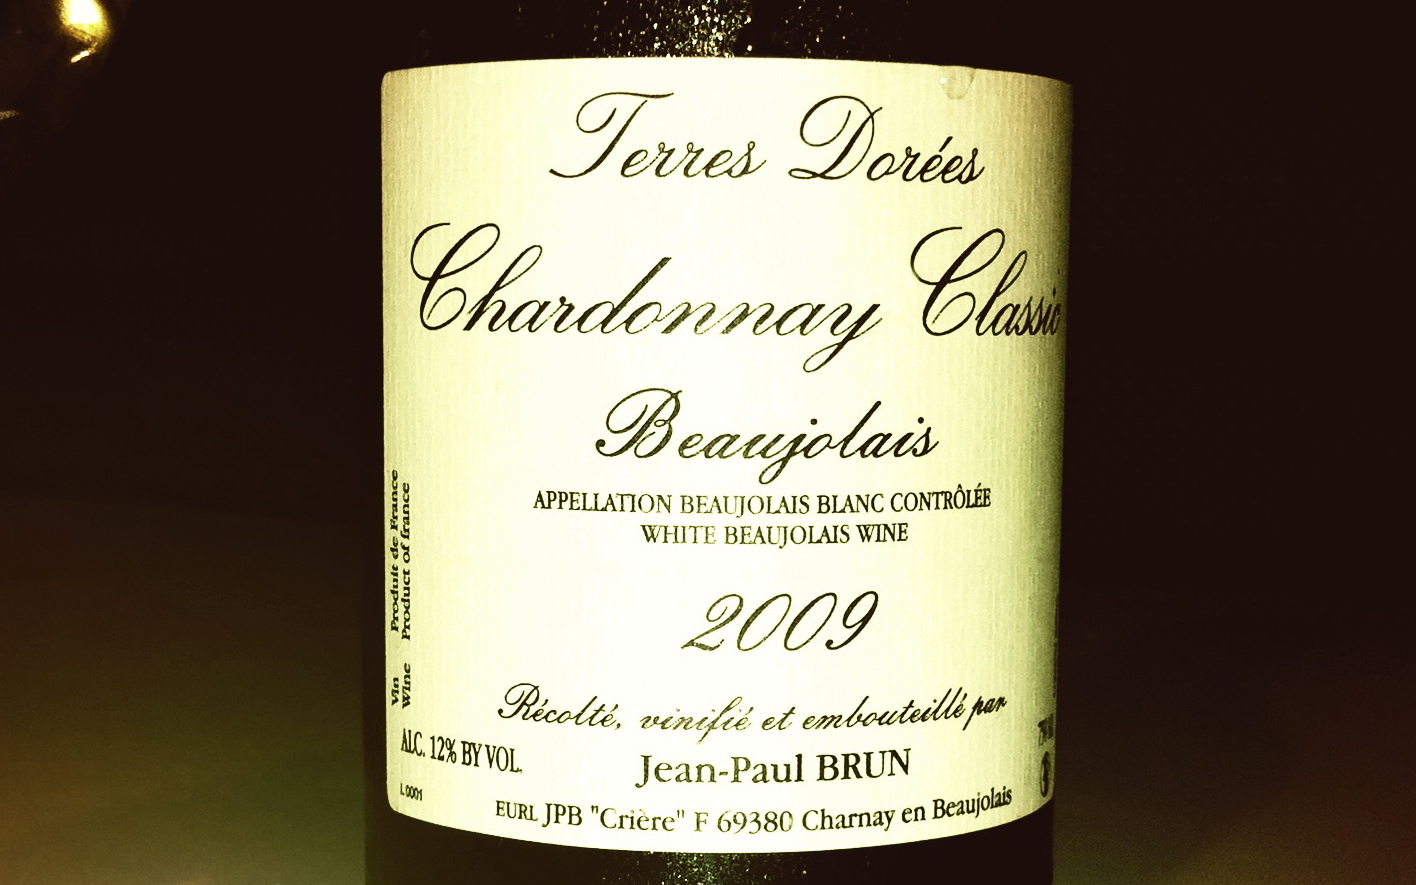 Blog vin - Jean Paul Brun - Chardonnay - 2009 - Beaujolais